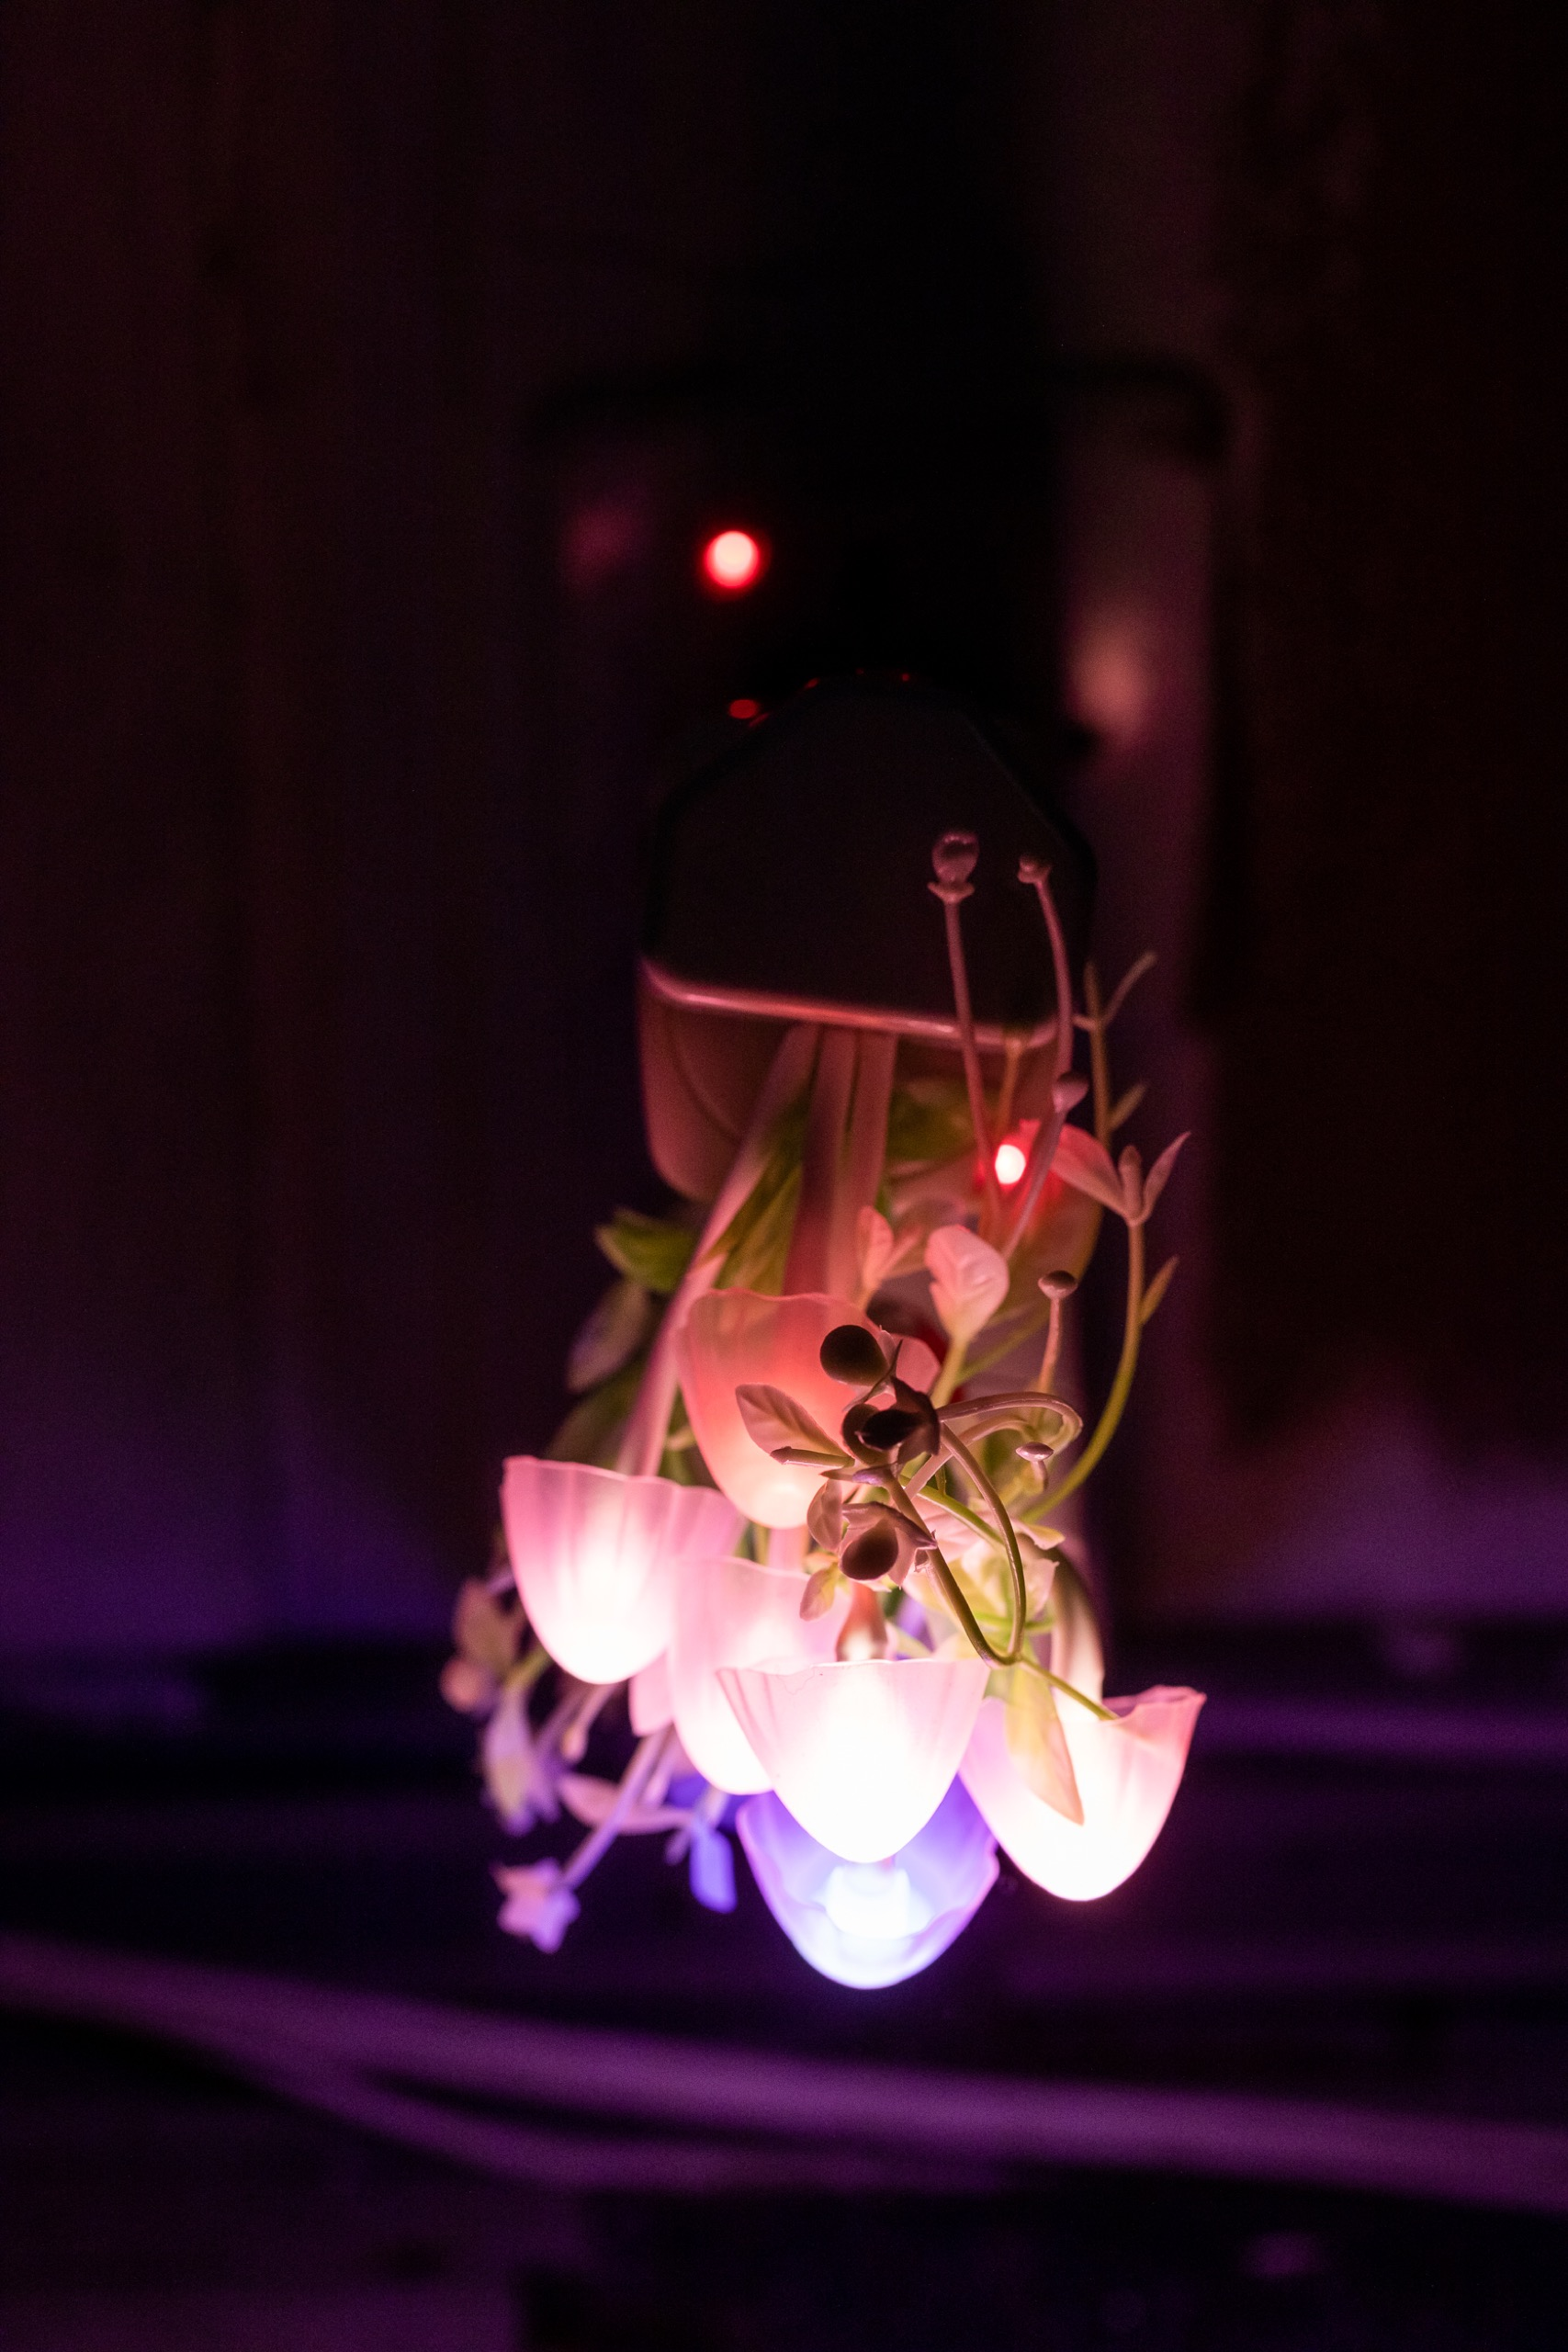 Trevor Yeung, Night Mushroom Colon (Two), 2017, night lamps, various plug adaptors